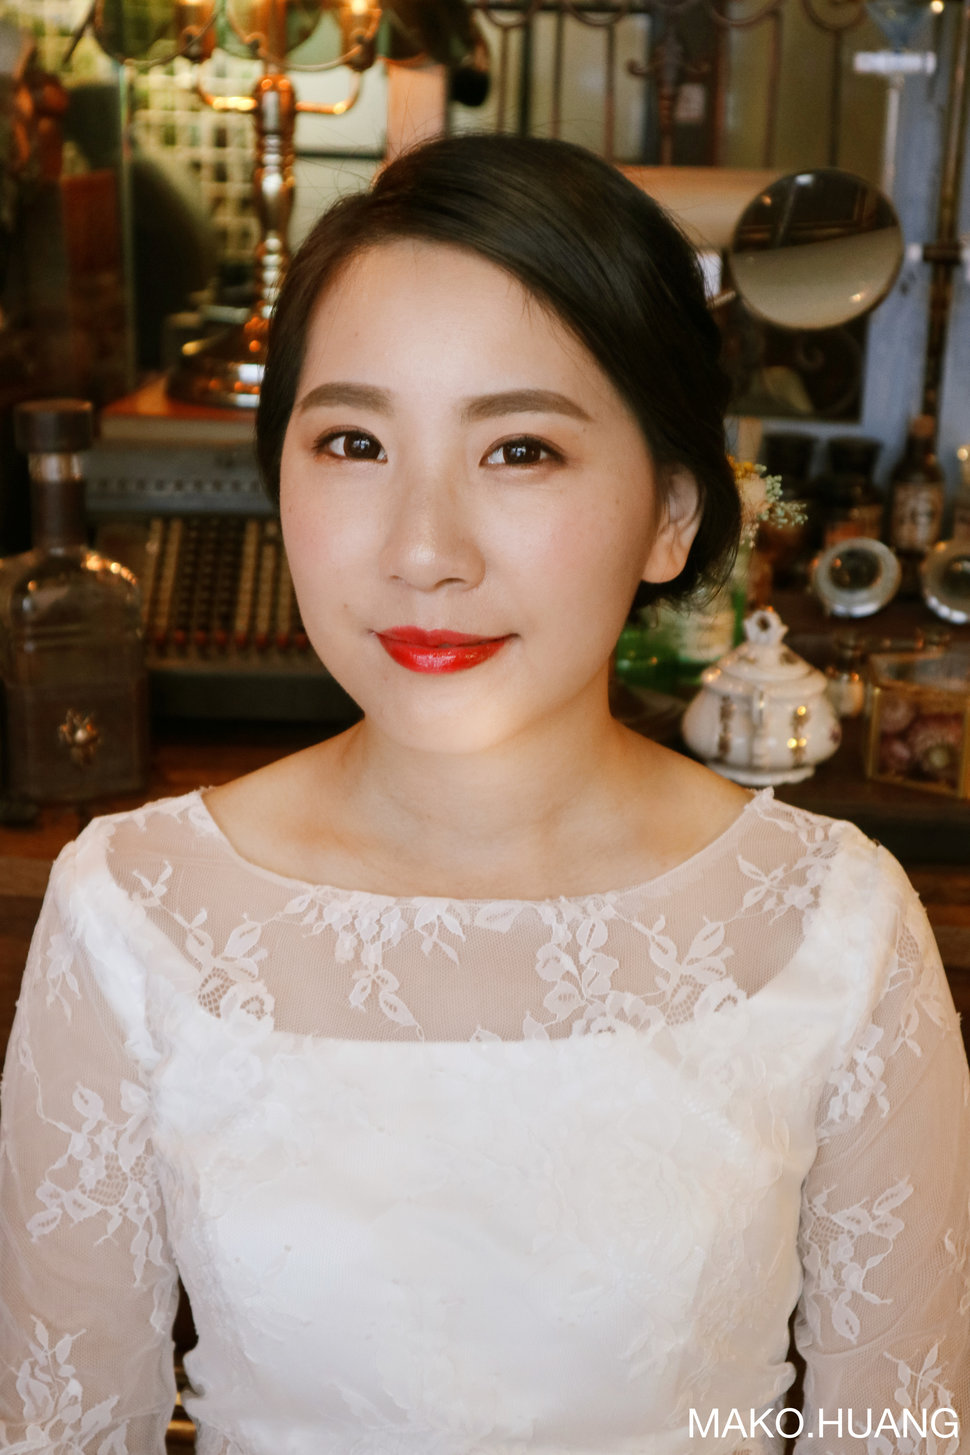 IMG_6673 - mako.huang - 結婚吧